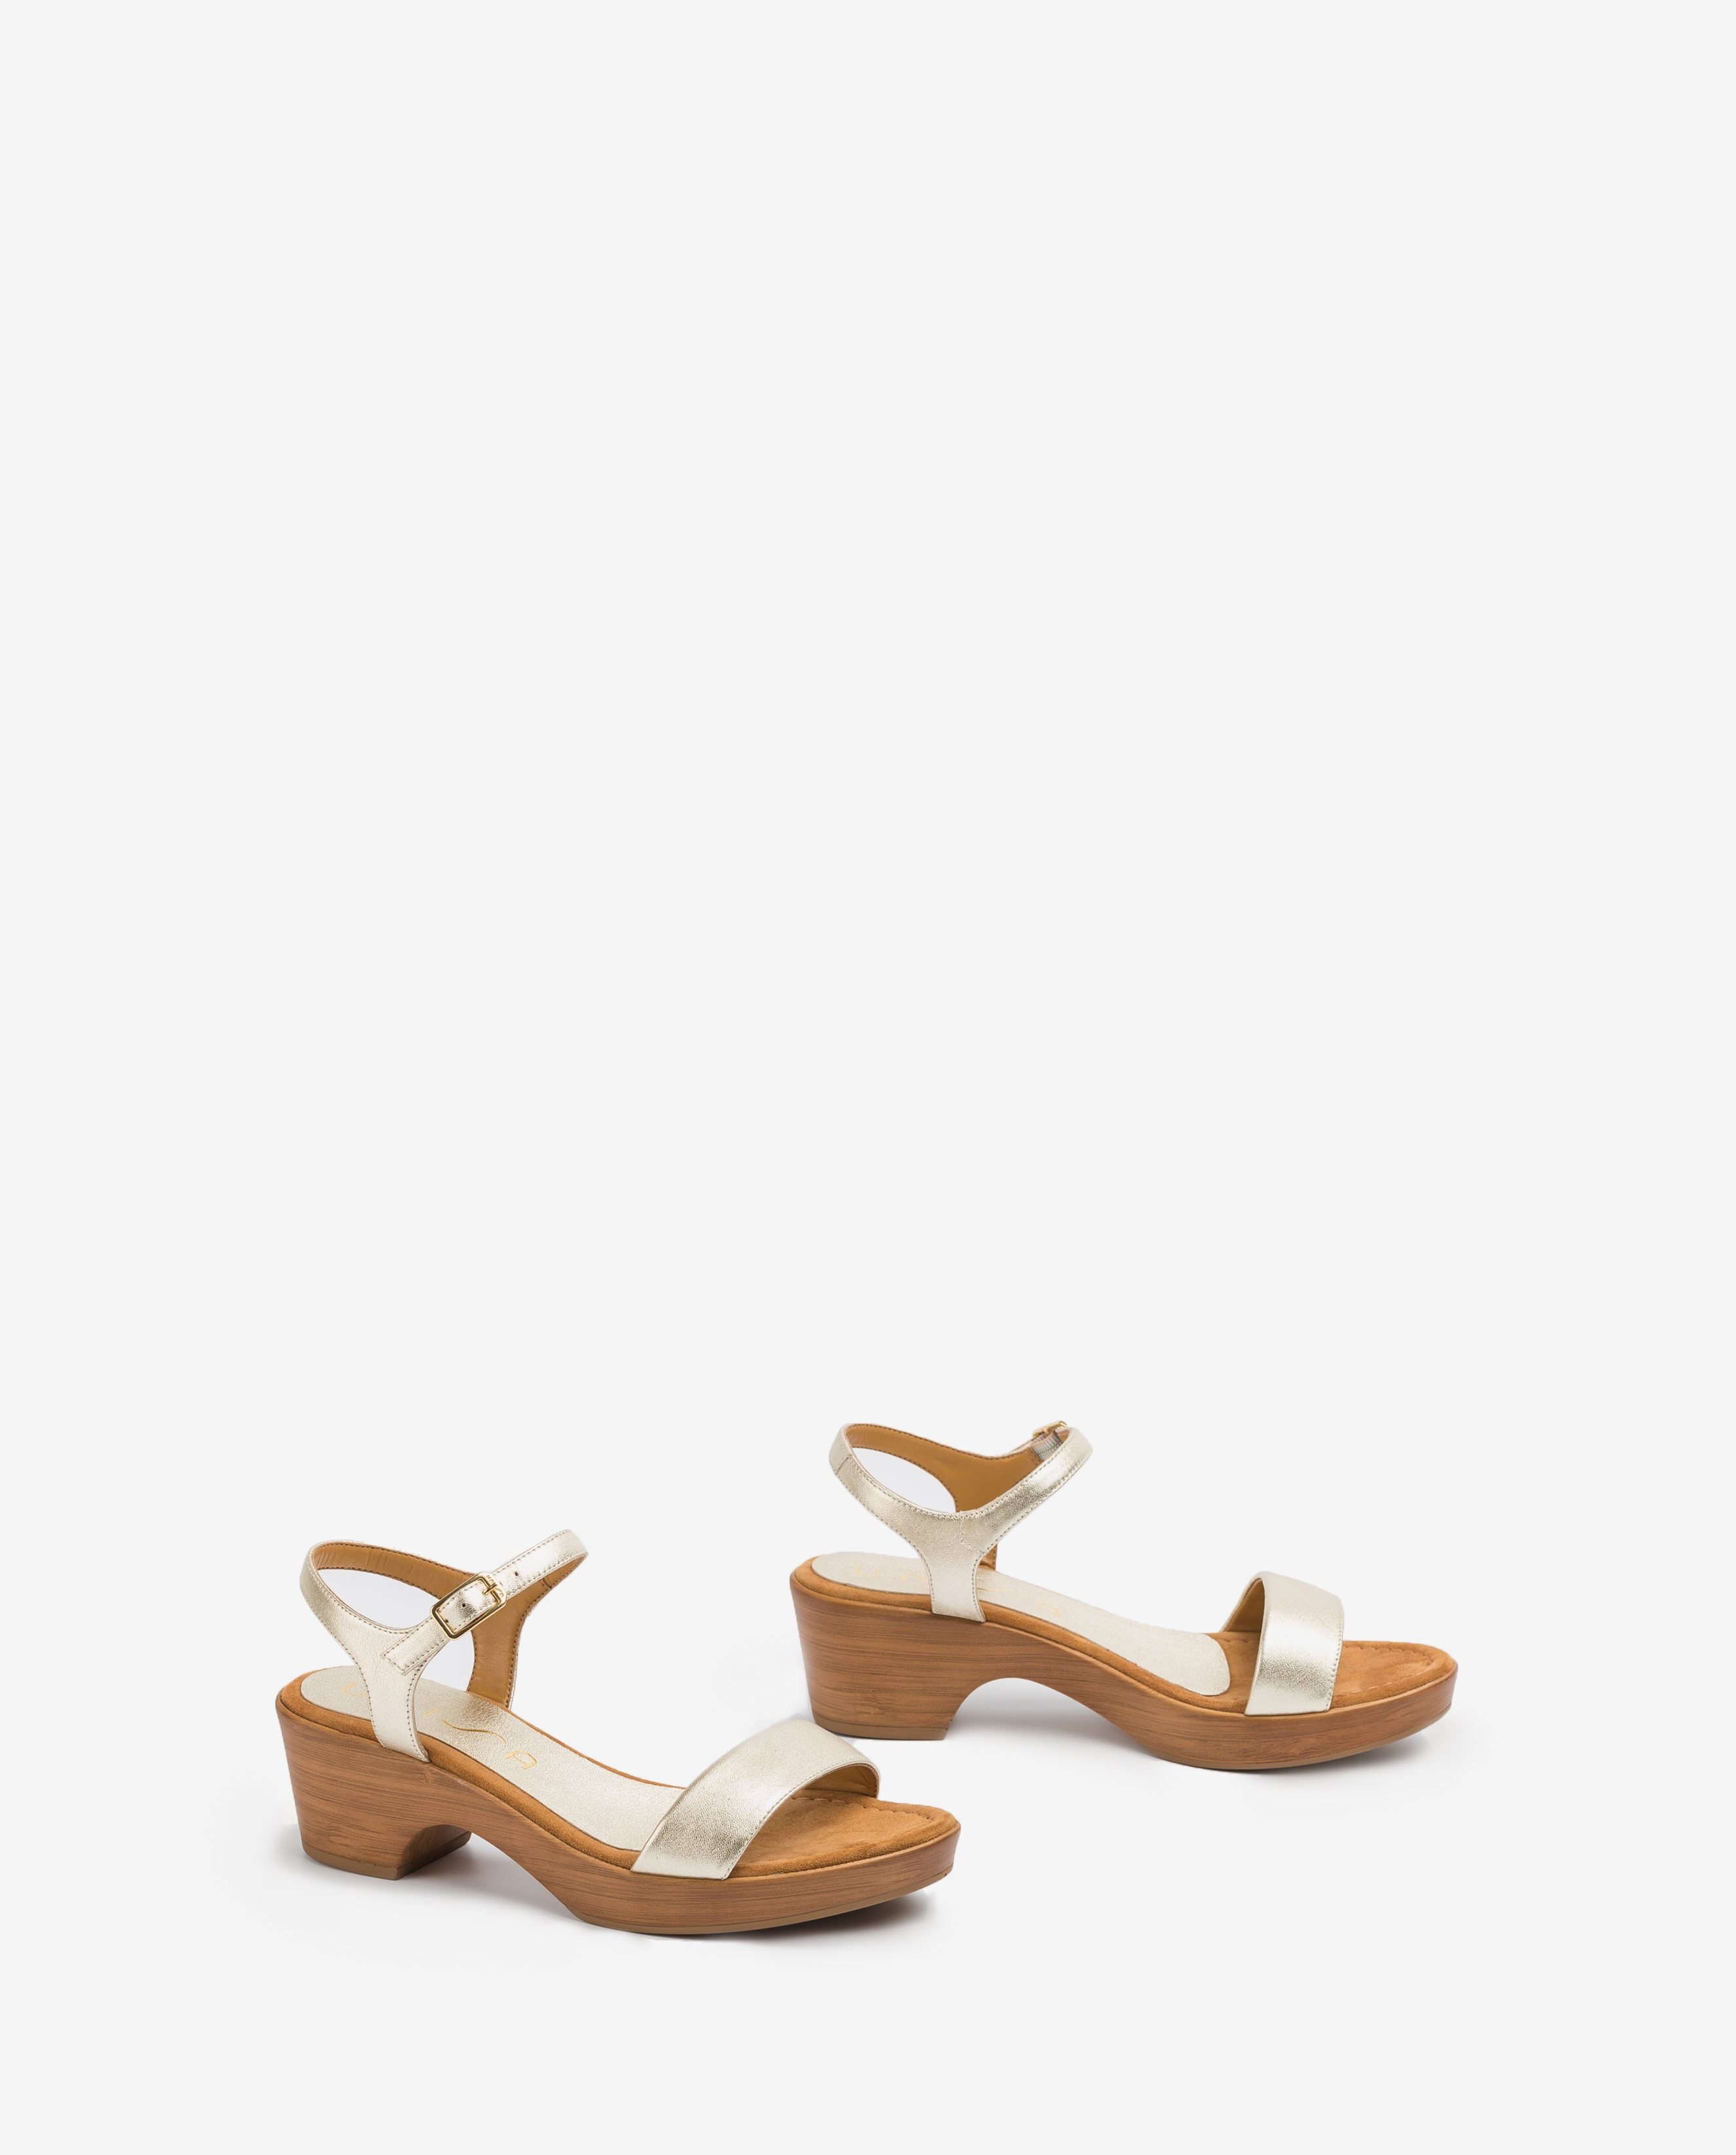 UNISA Metal effect block sandals IRITA_20_LMT platino 2